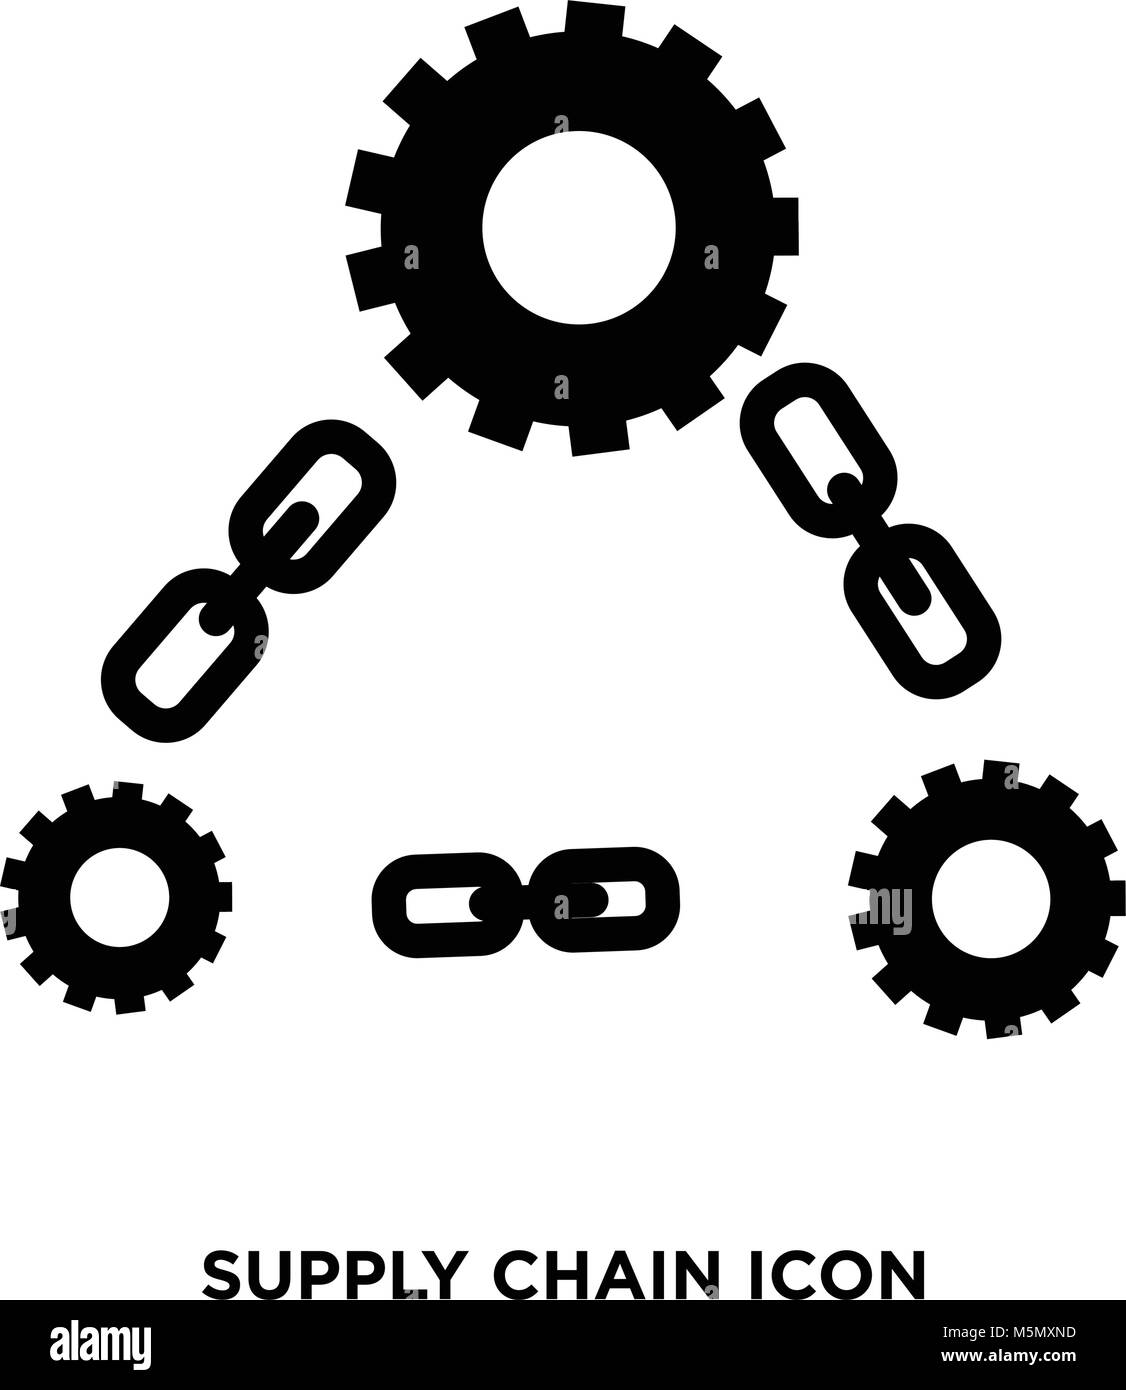 Supply Chain Symbol Vektor Abbildung Bild 175636985 Alamy